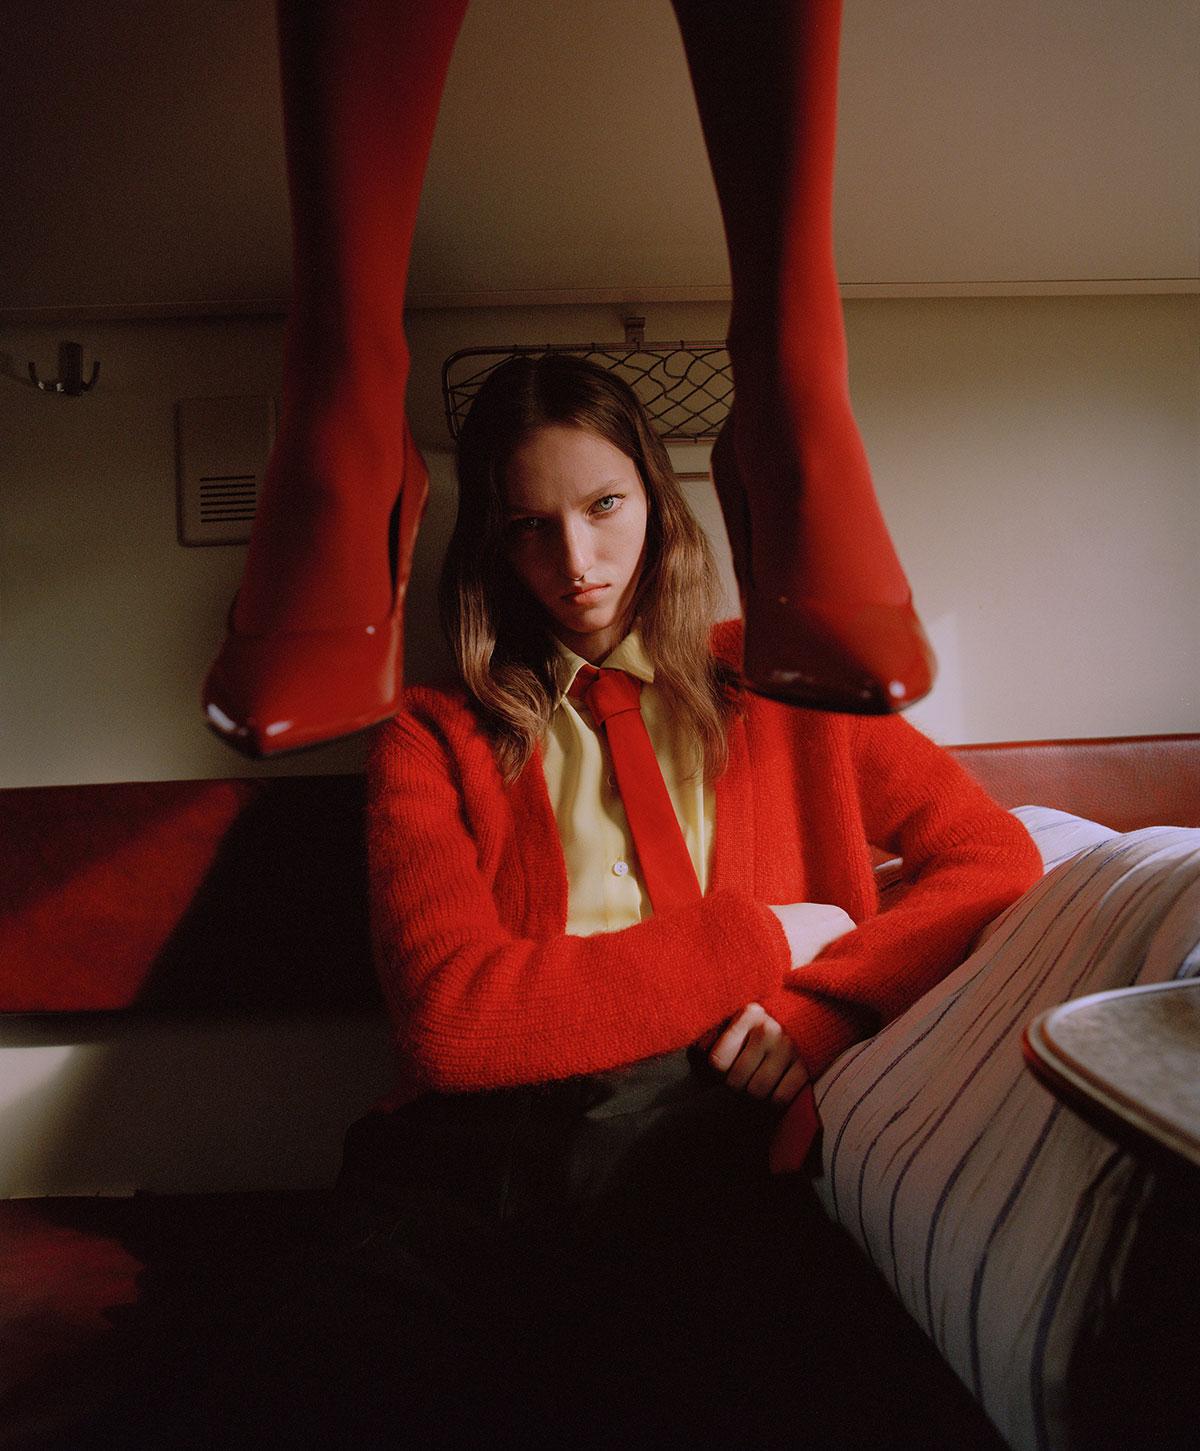 Elle Russia November 2020 在火车上的时尚大片 时尚图库 第3张